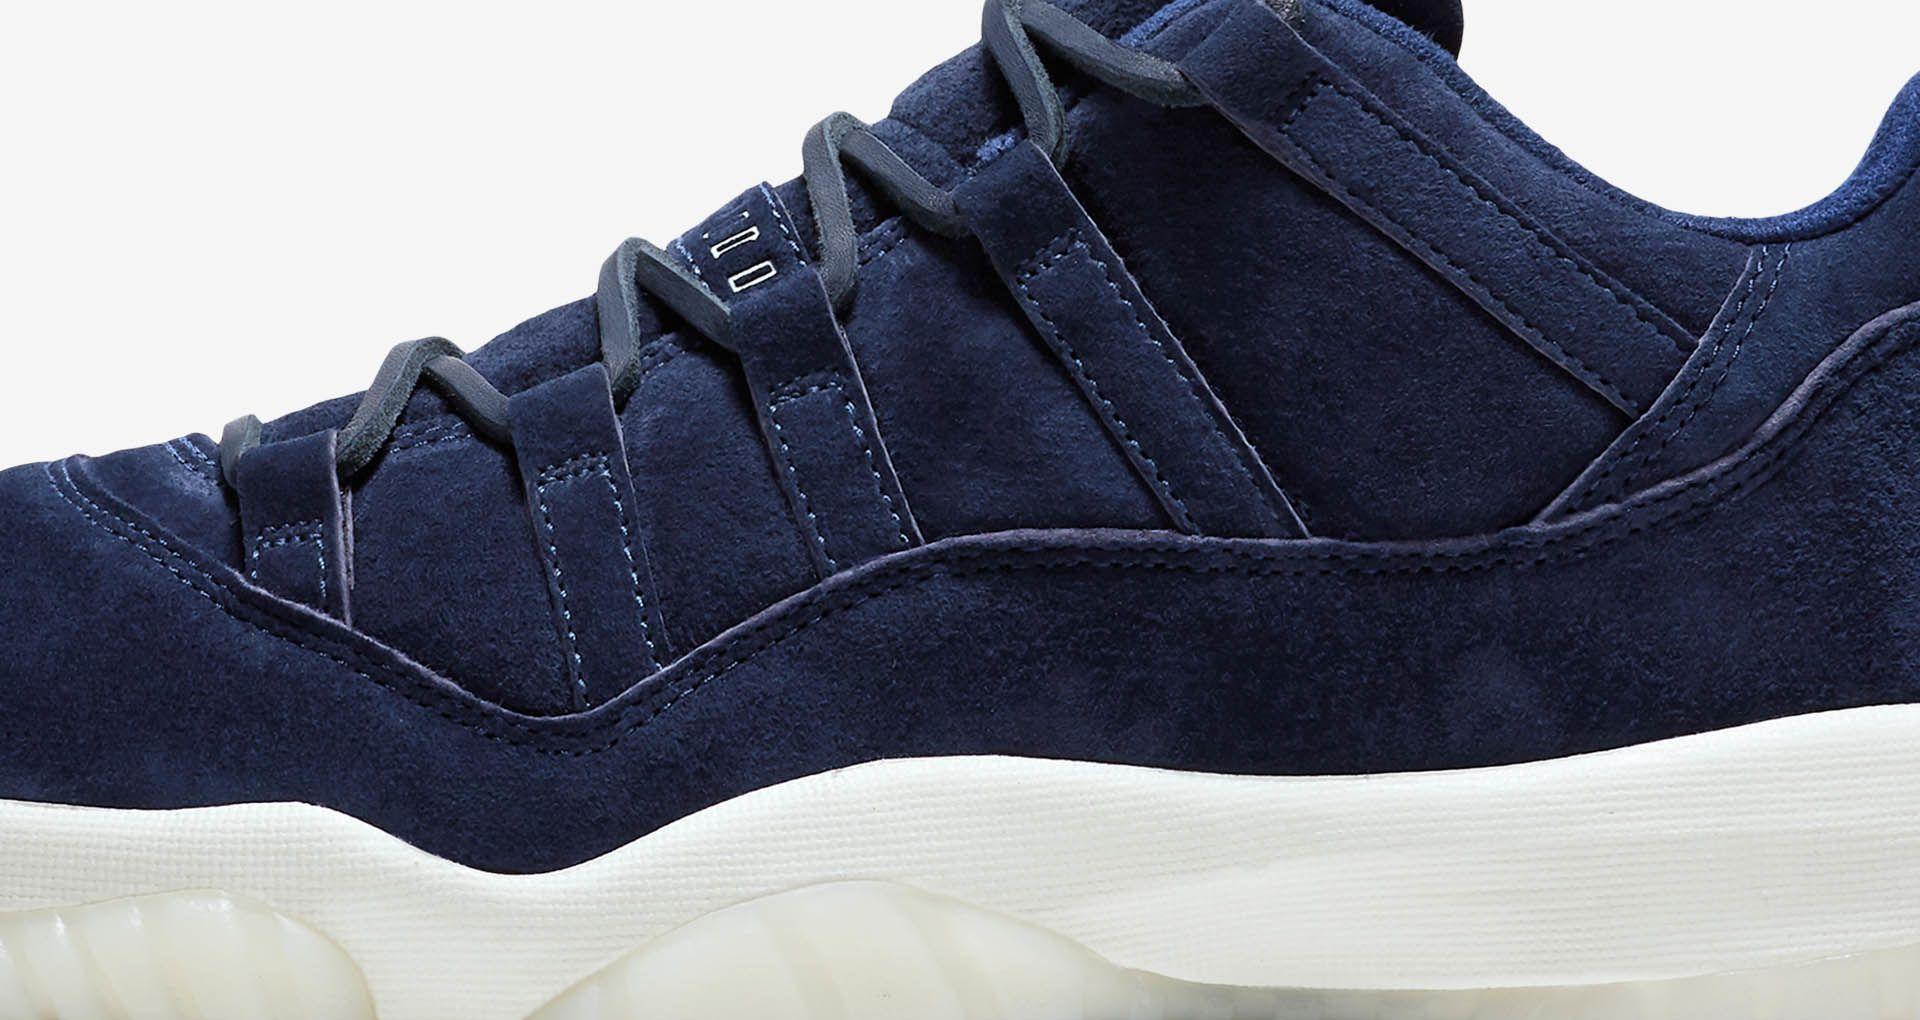 on sale ef244 20b4c Air Jordan 11 Low 'Binary Blue' Release Date. Nike+ SNKRS